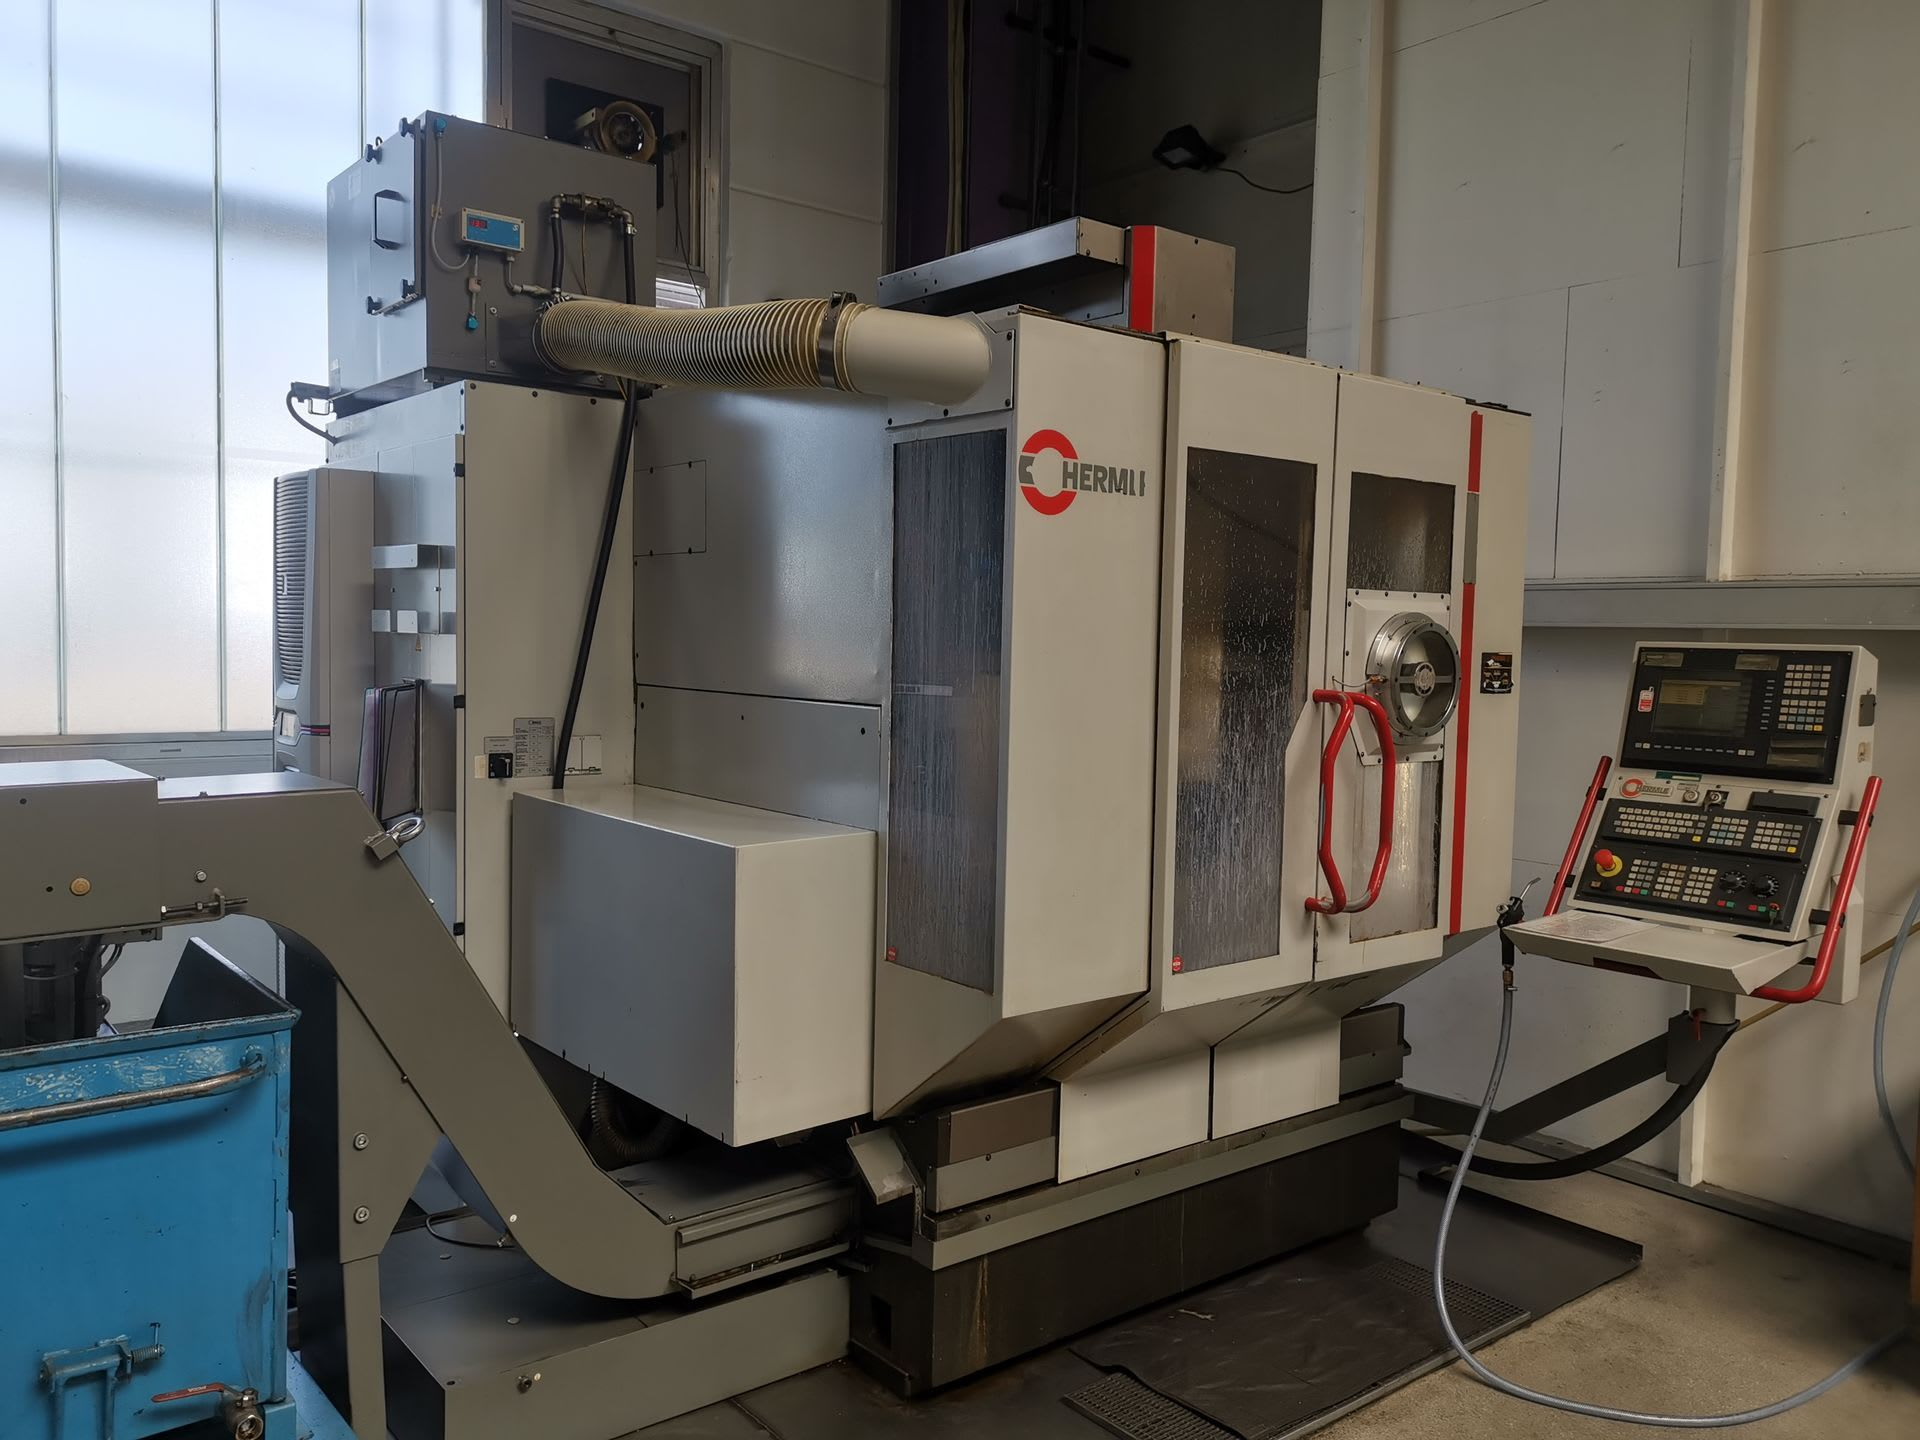 HERMLE C 800 U CNC 5-Achs Bearbeitungszentrum